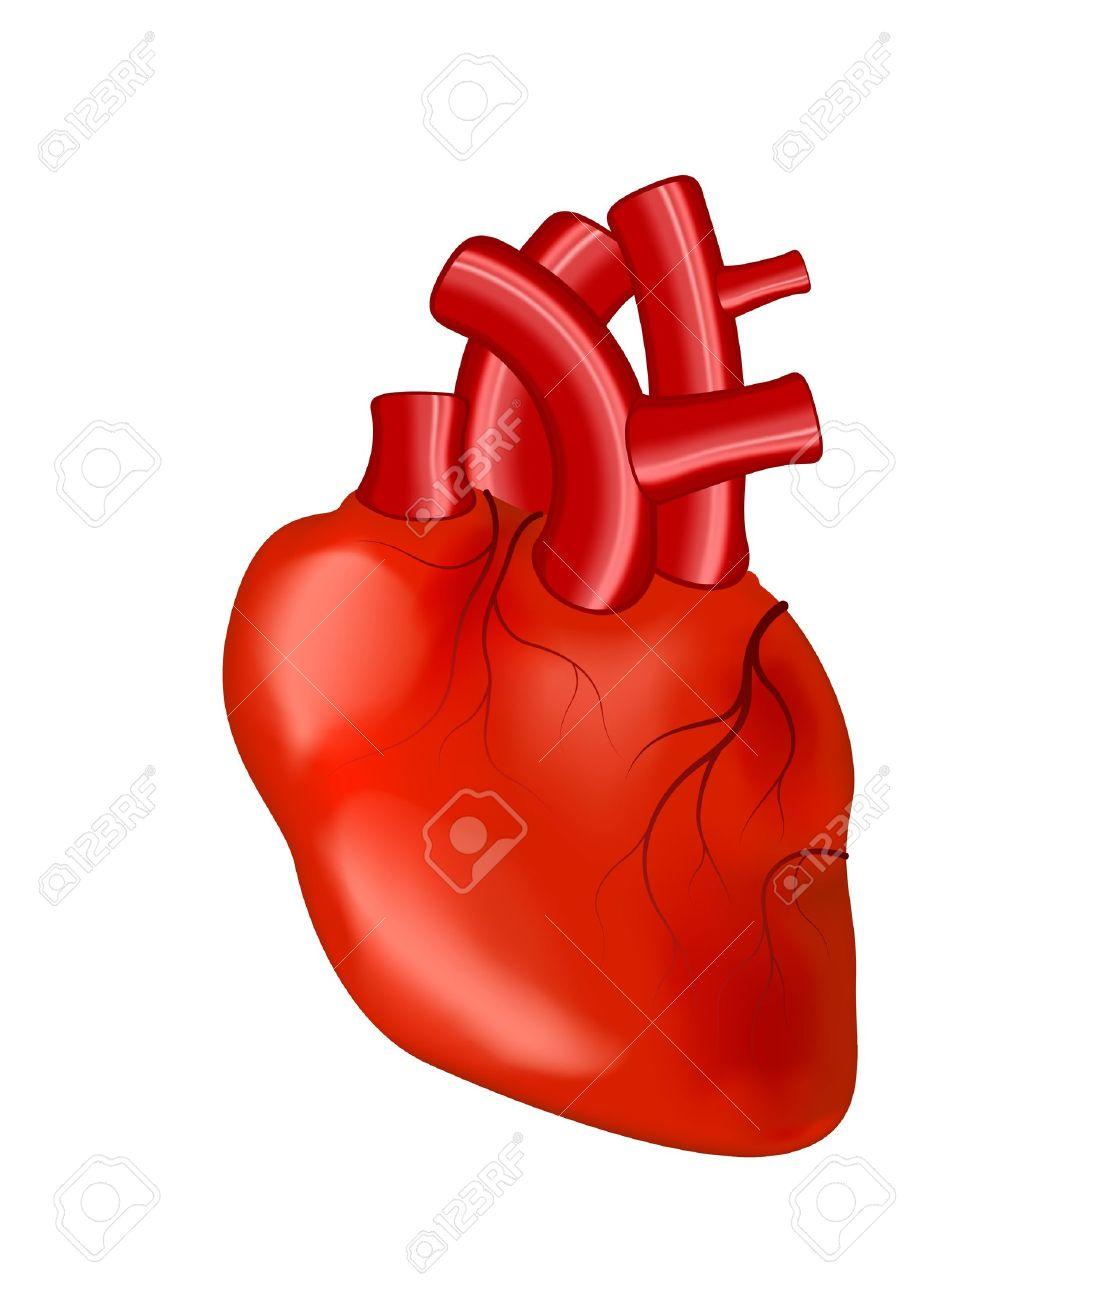 Human Heart Vector Image Human Heart Human Heart